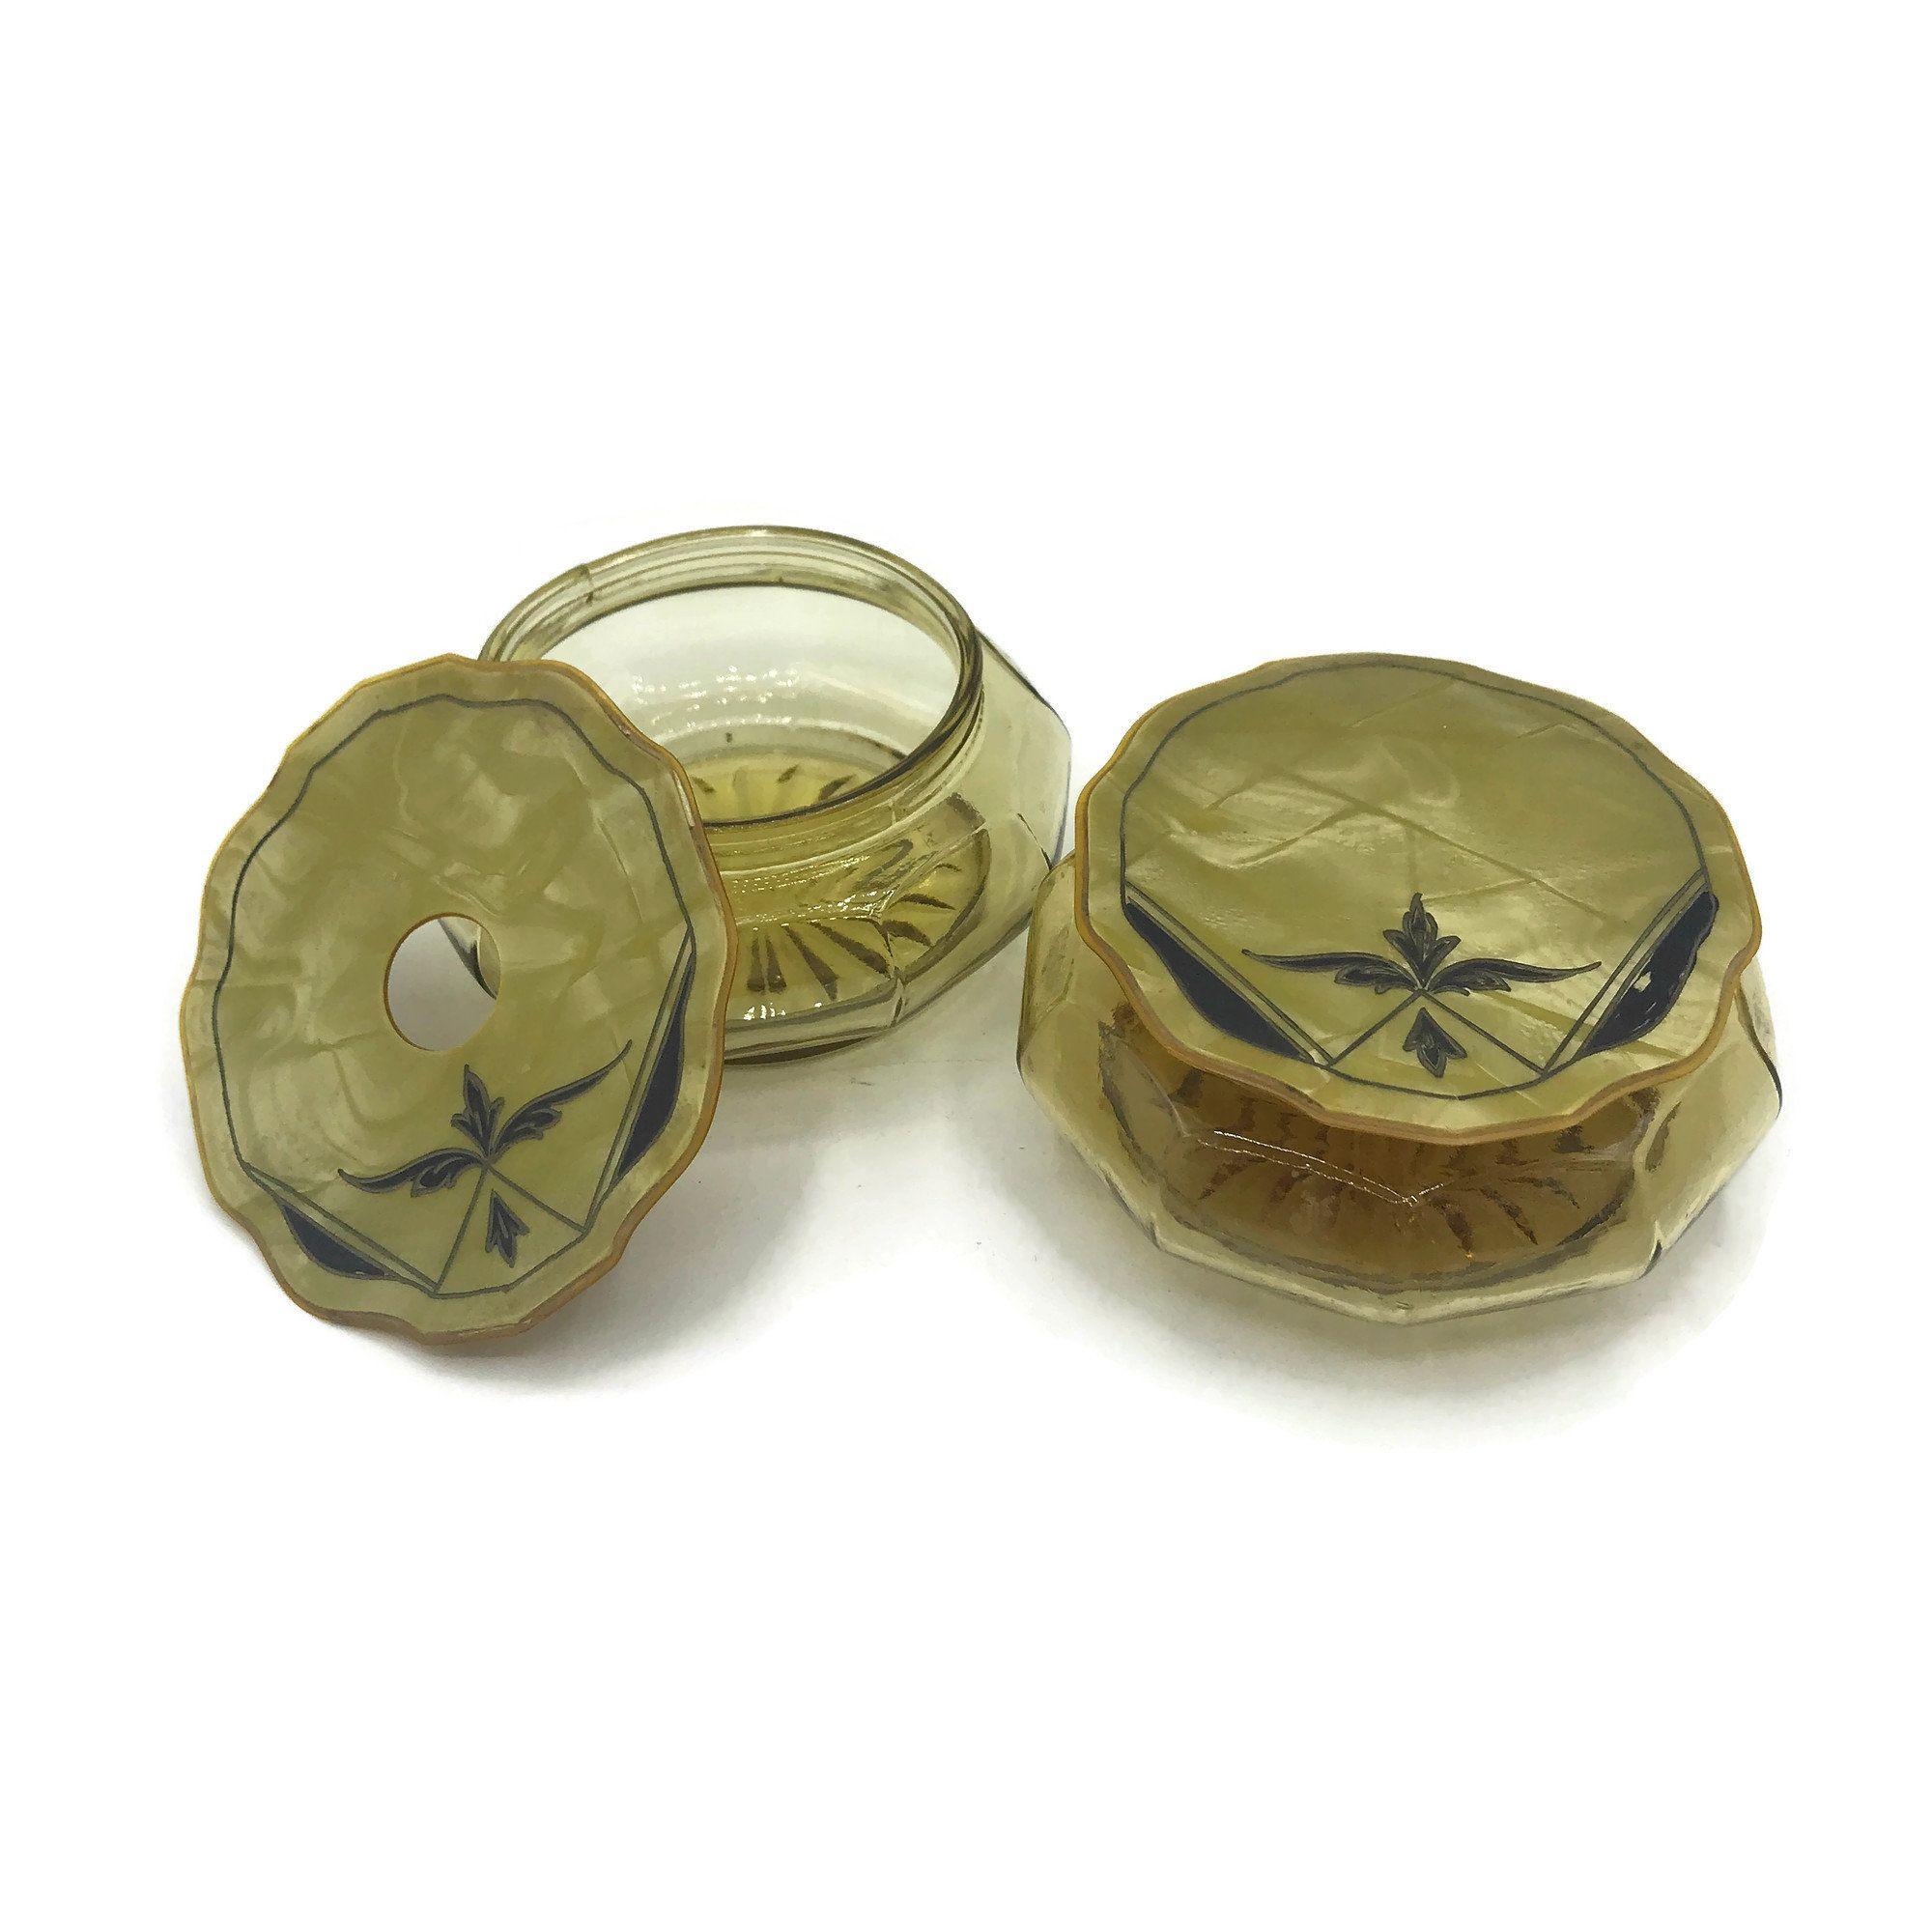 Antique Crystal Art Nouveau Hair Receiver Jar with Brass Top